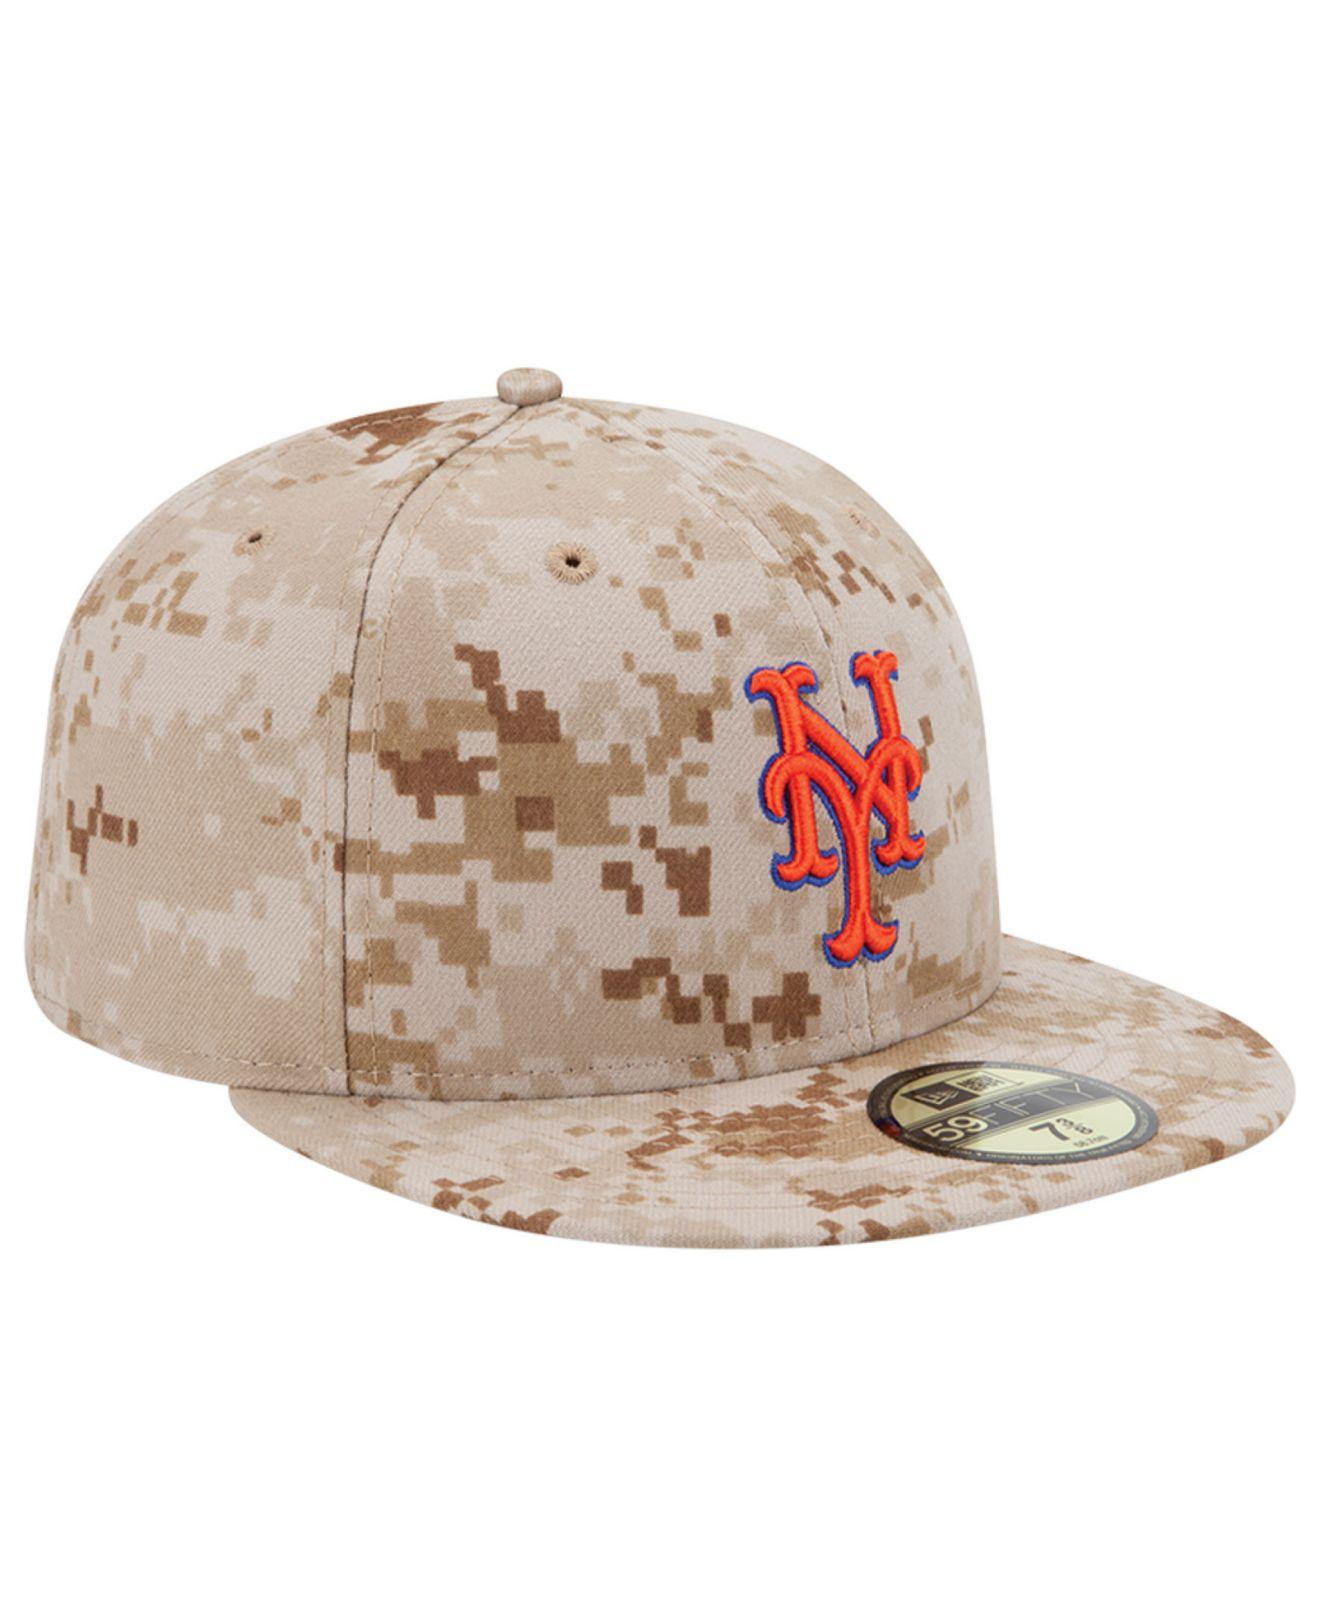 Lyst - KTZ New York Mets Mlb 2013 Memorial Day Stars   Stripes ... f8ff9900c98